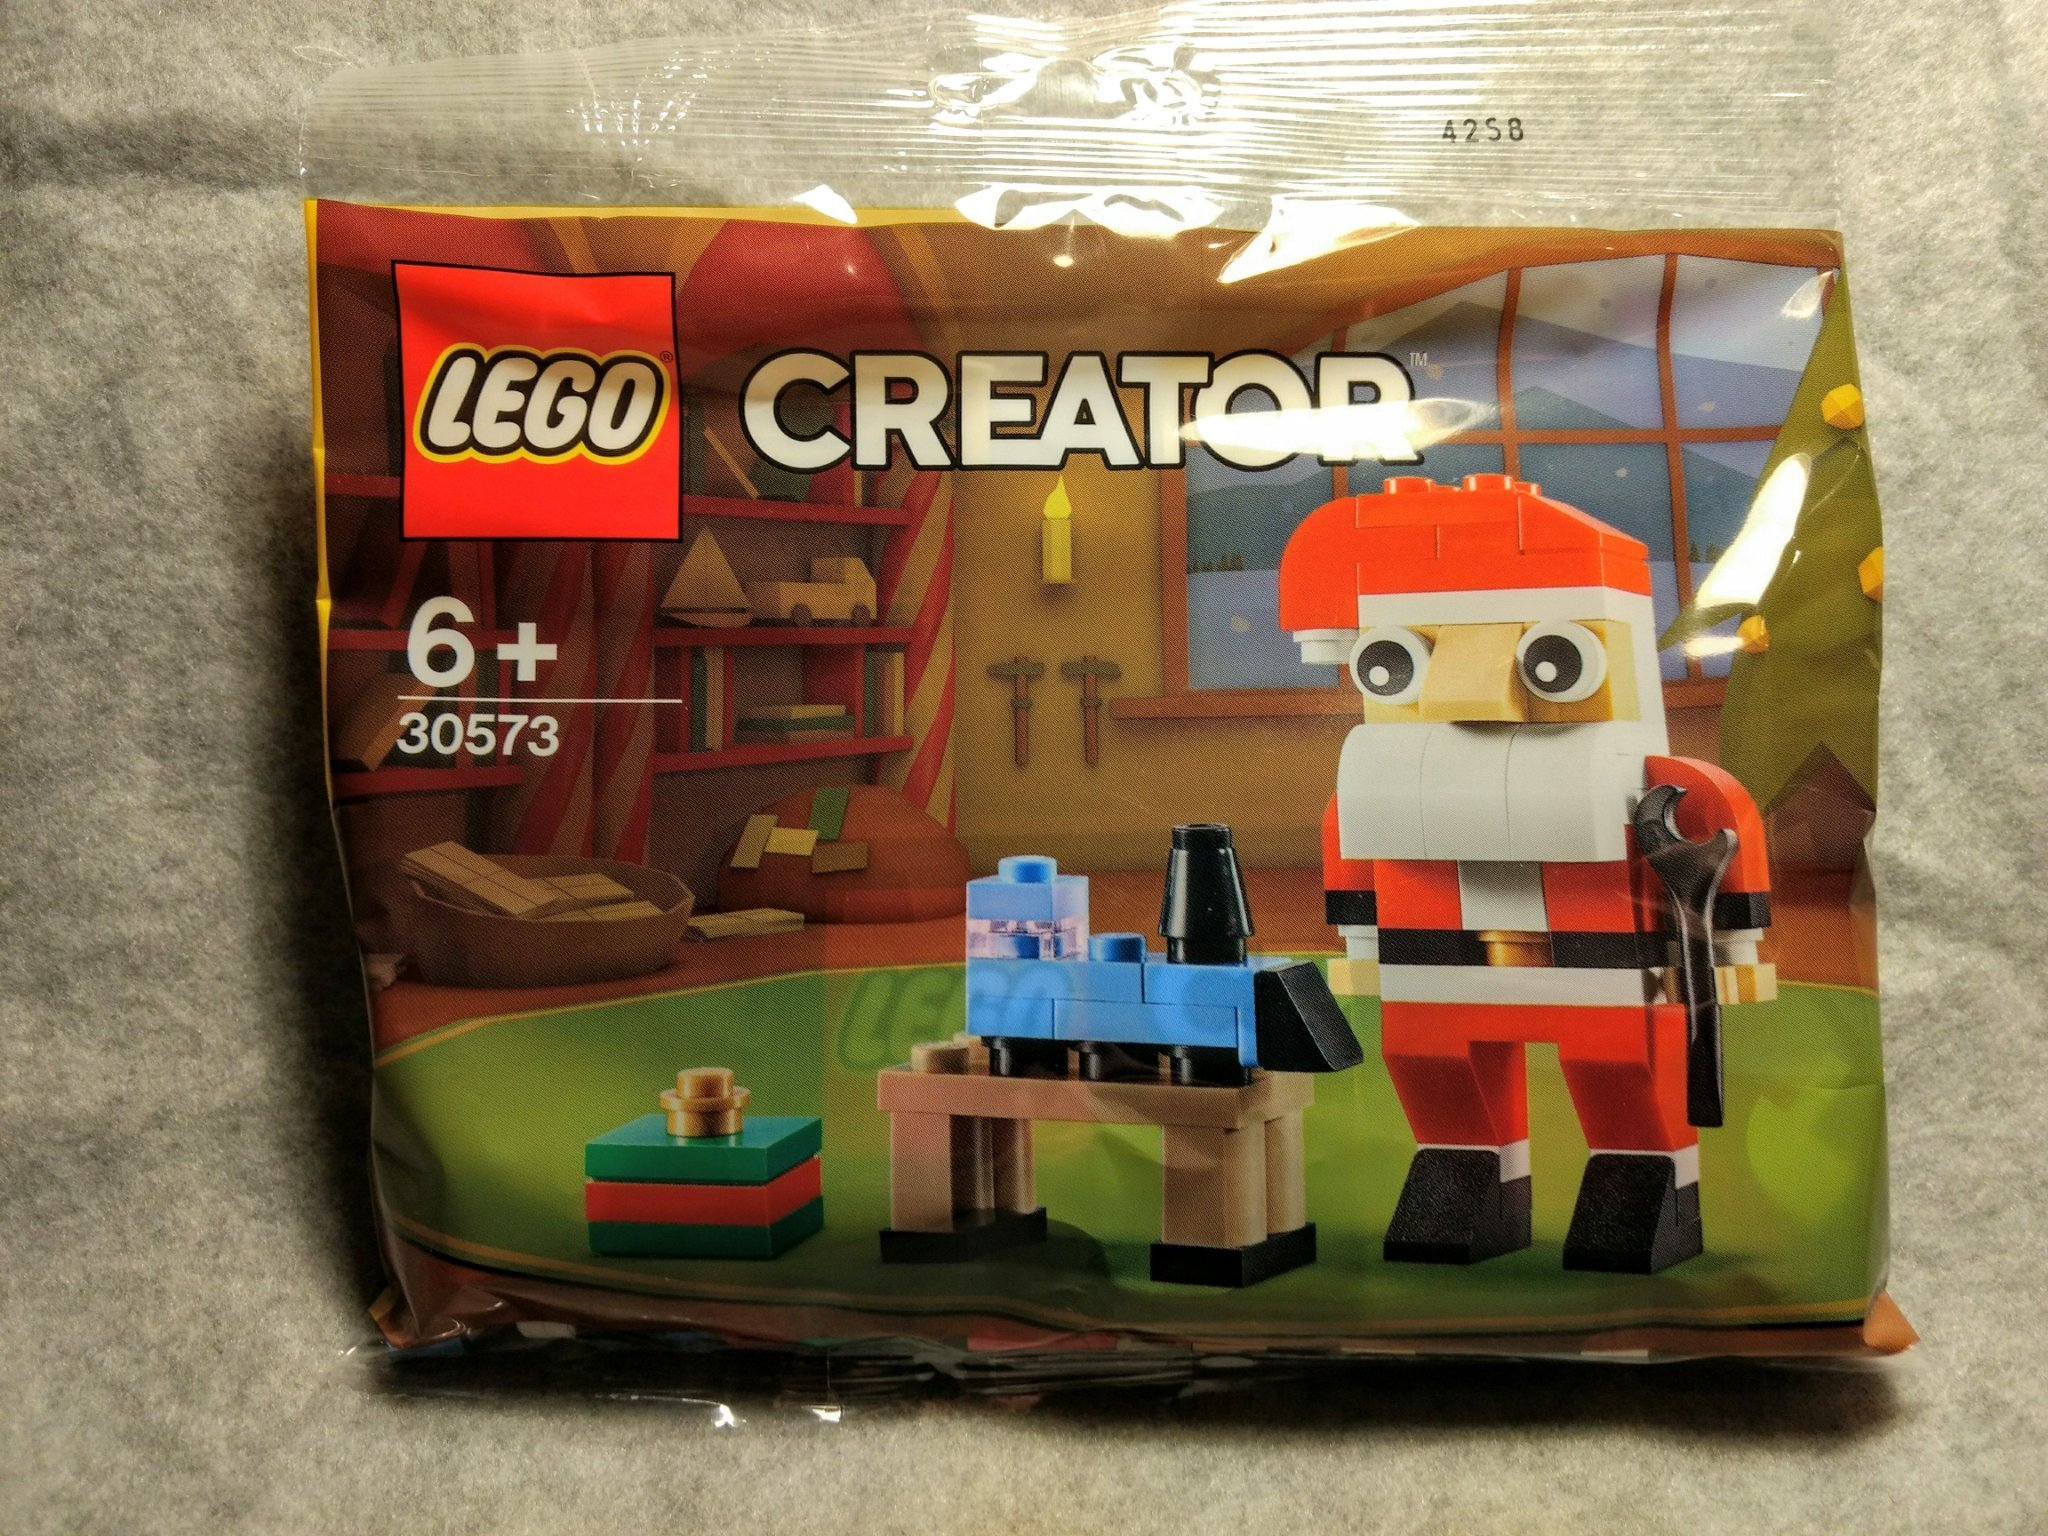 LEGO 8 x Basisplatte 4x8 gelb yellow basic plate 3035 303524